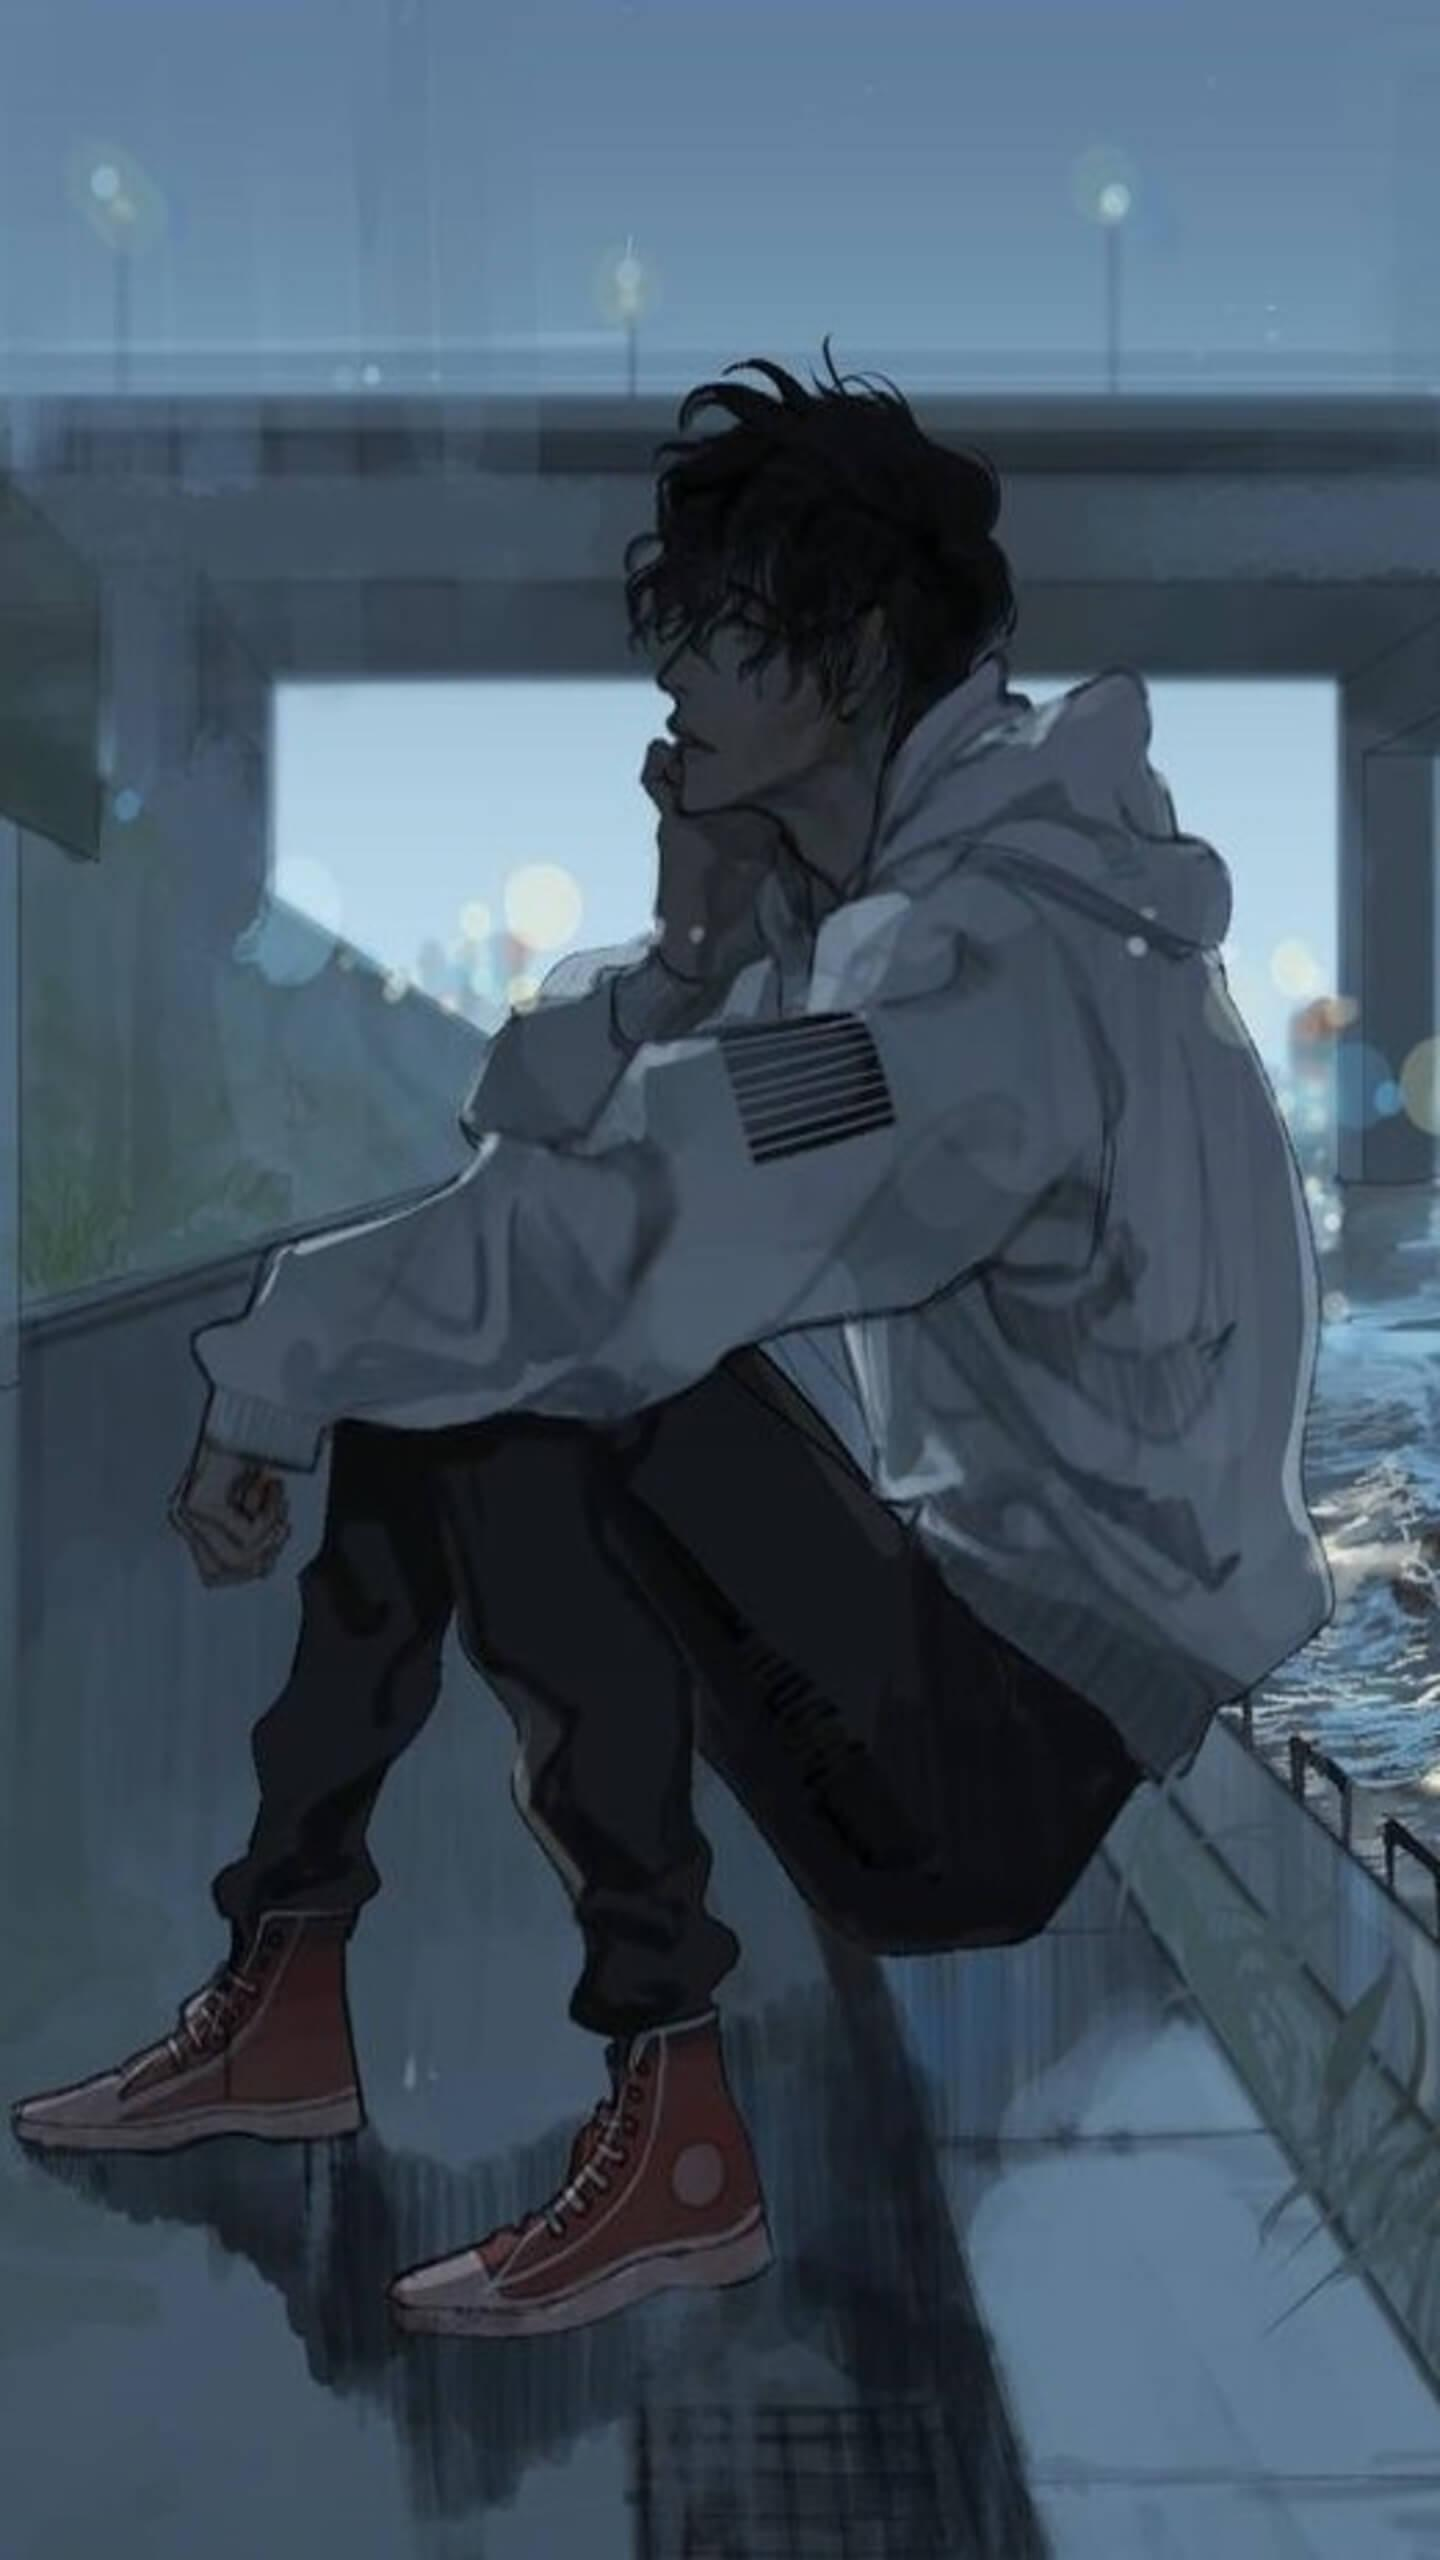 Depressed Anime Wallpaper Boy Sad